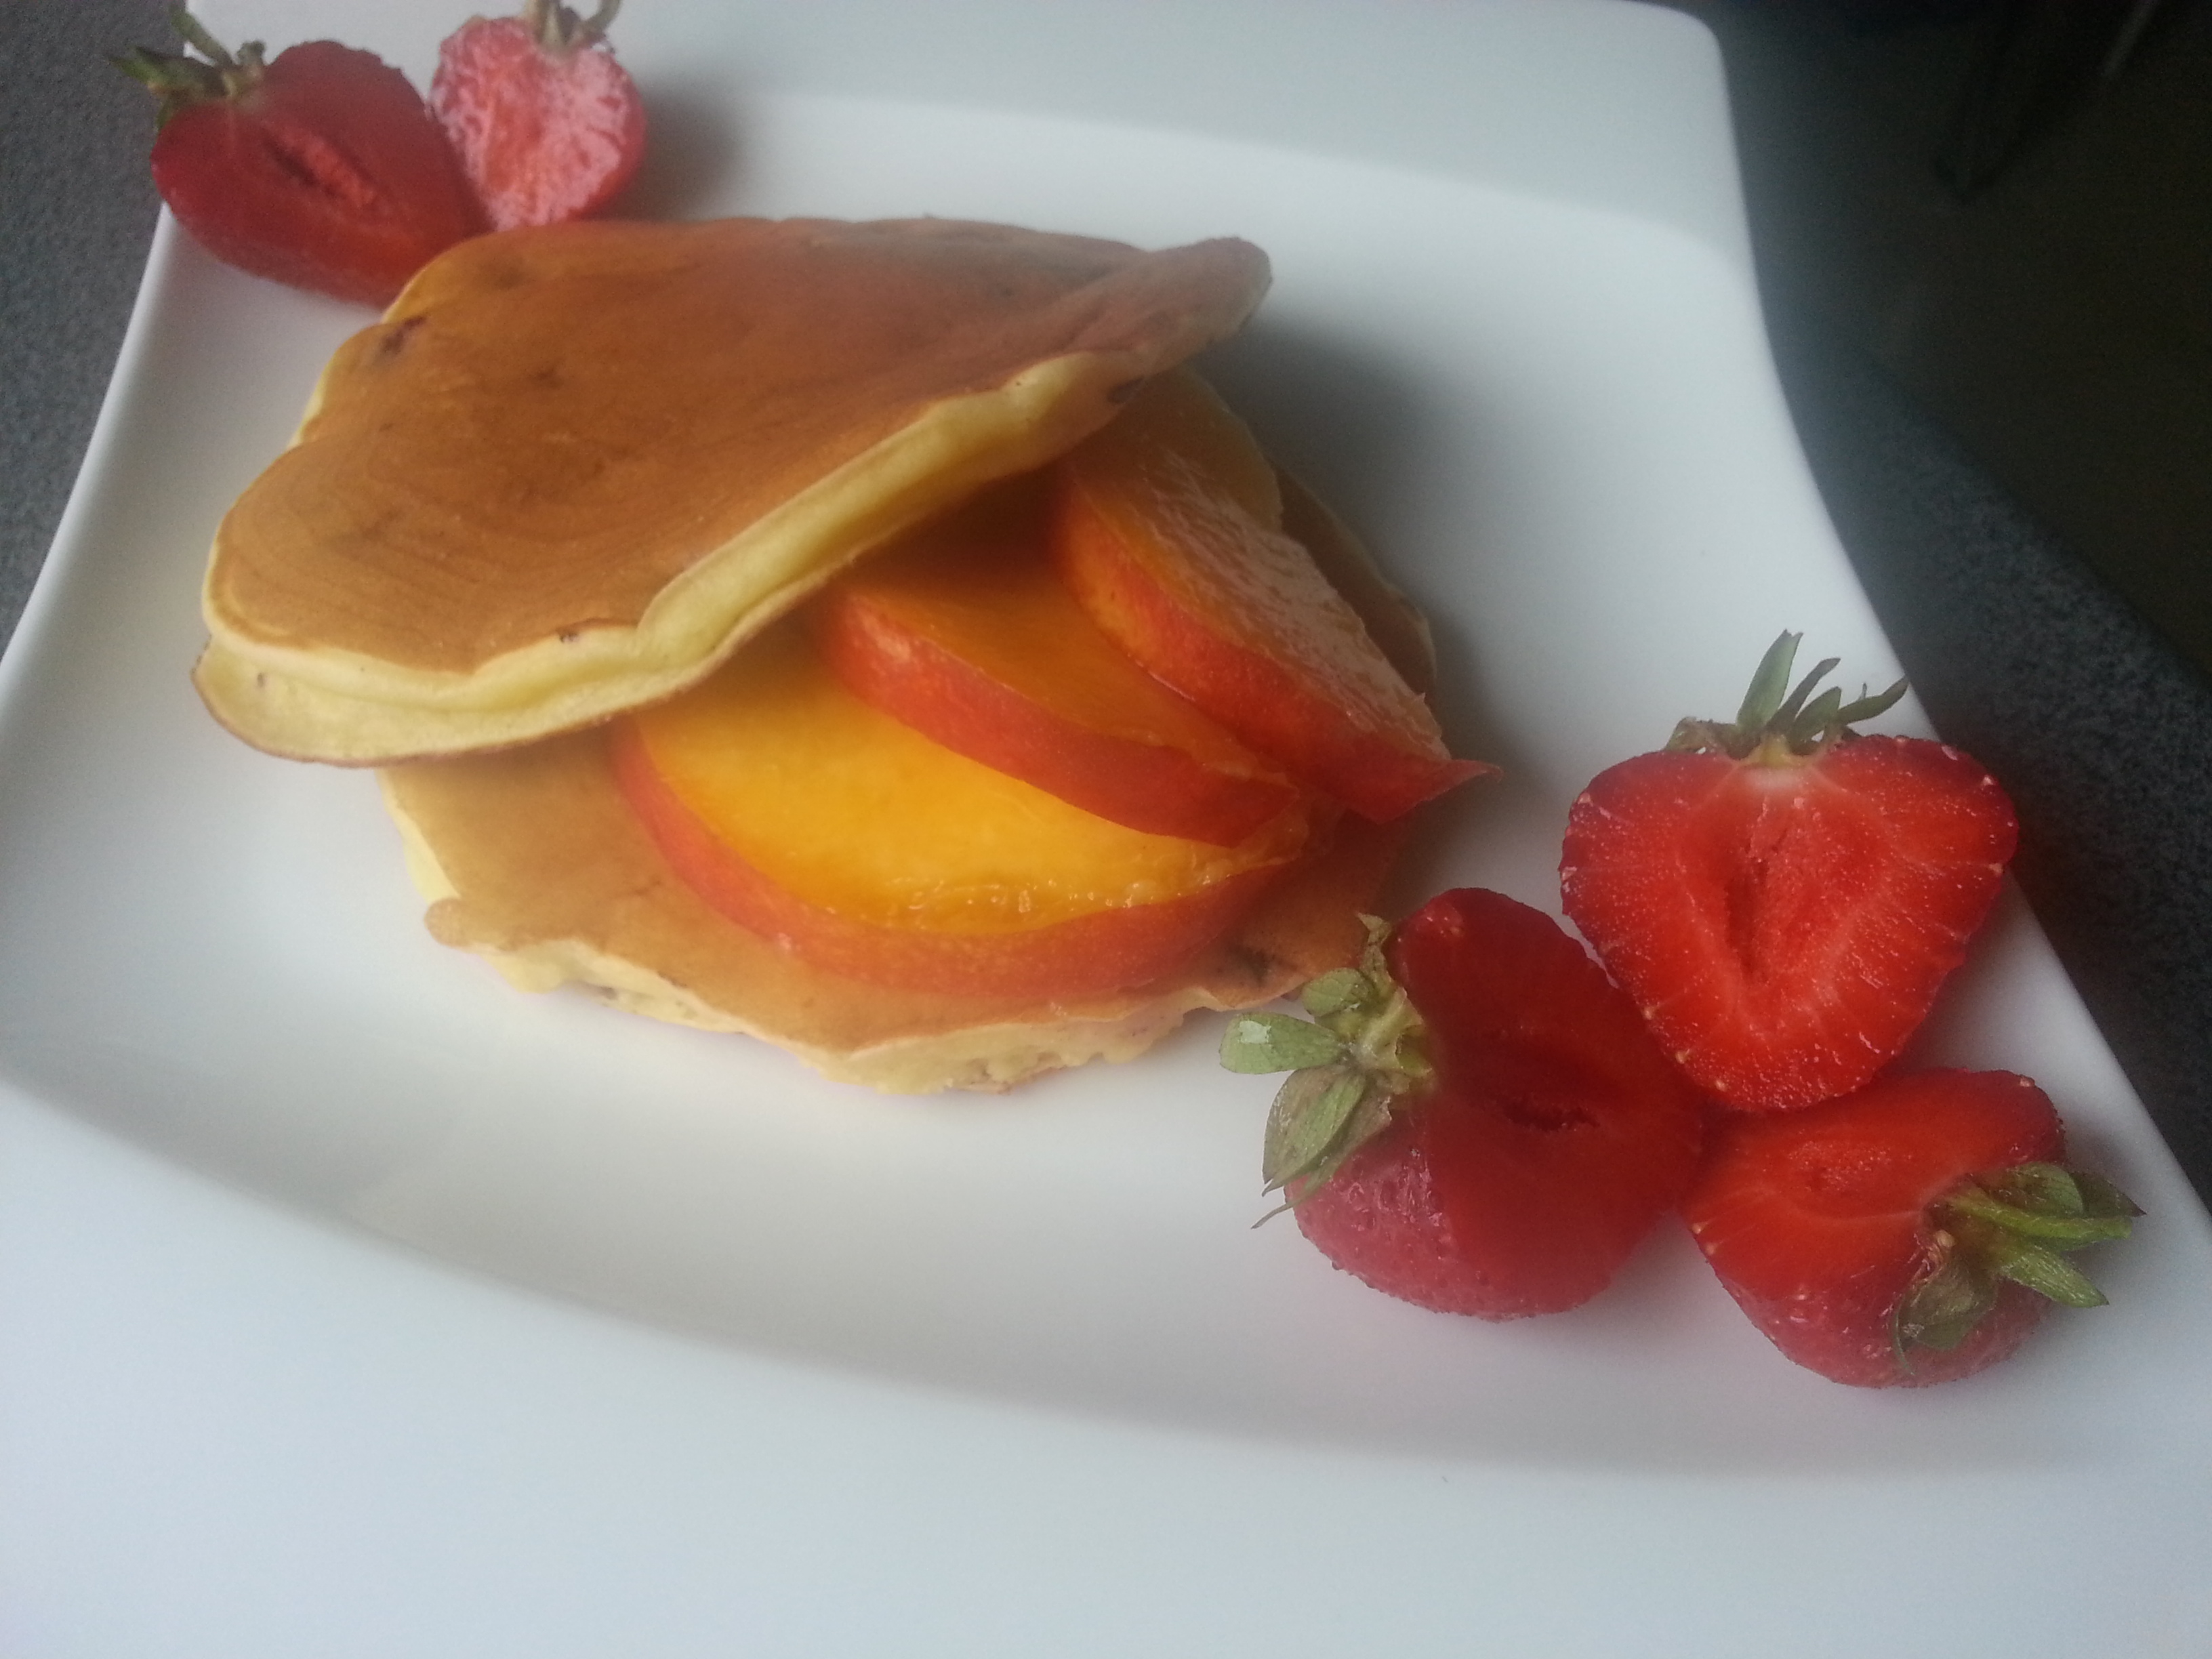 Jogurtowe pancakes z jagodami